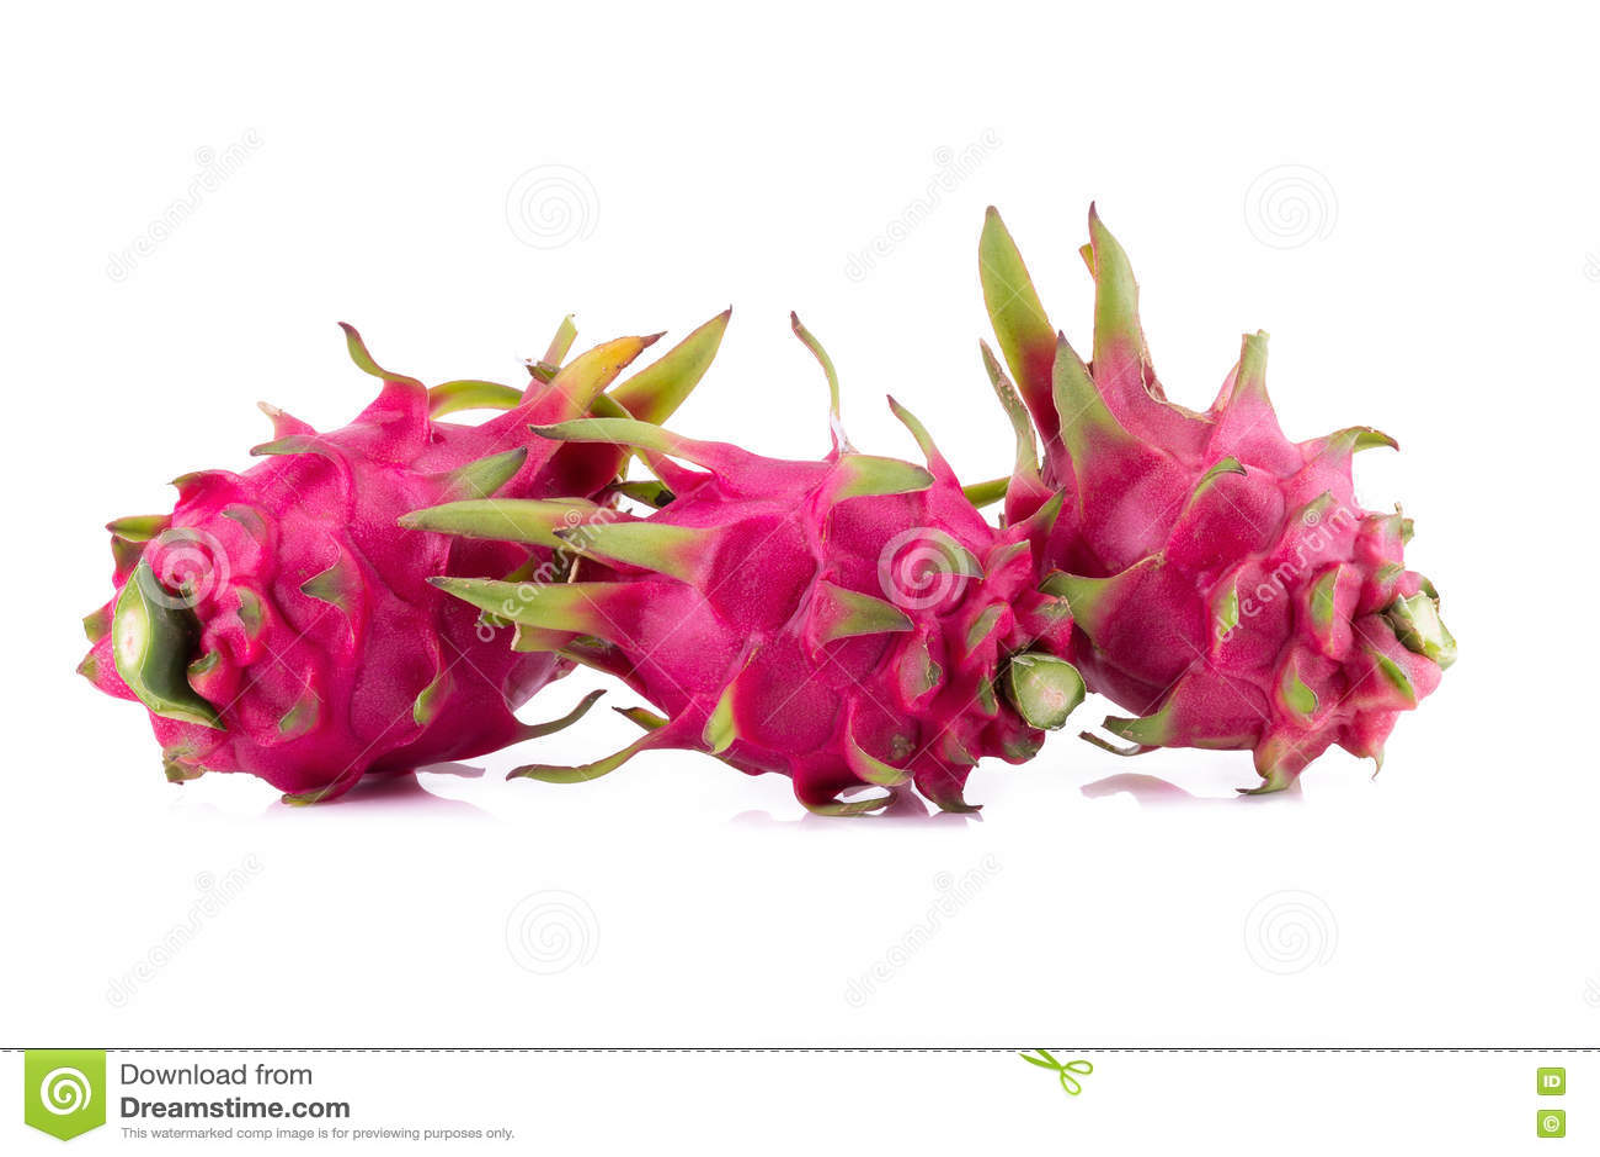 Dragon Fruit vivo e vibrante isolato su fondo bianco